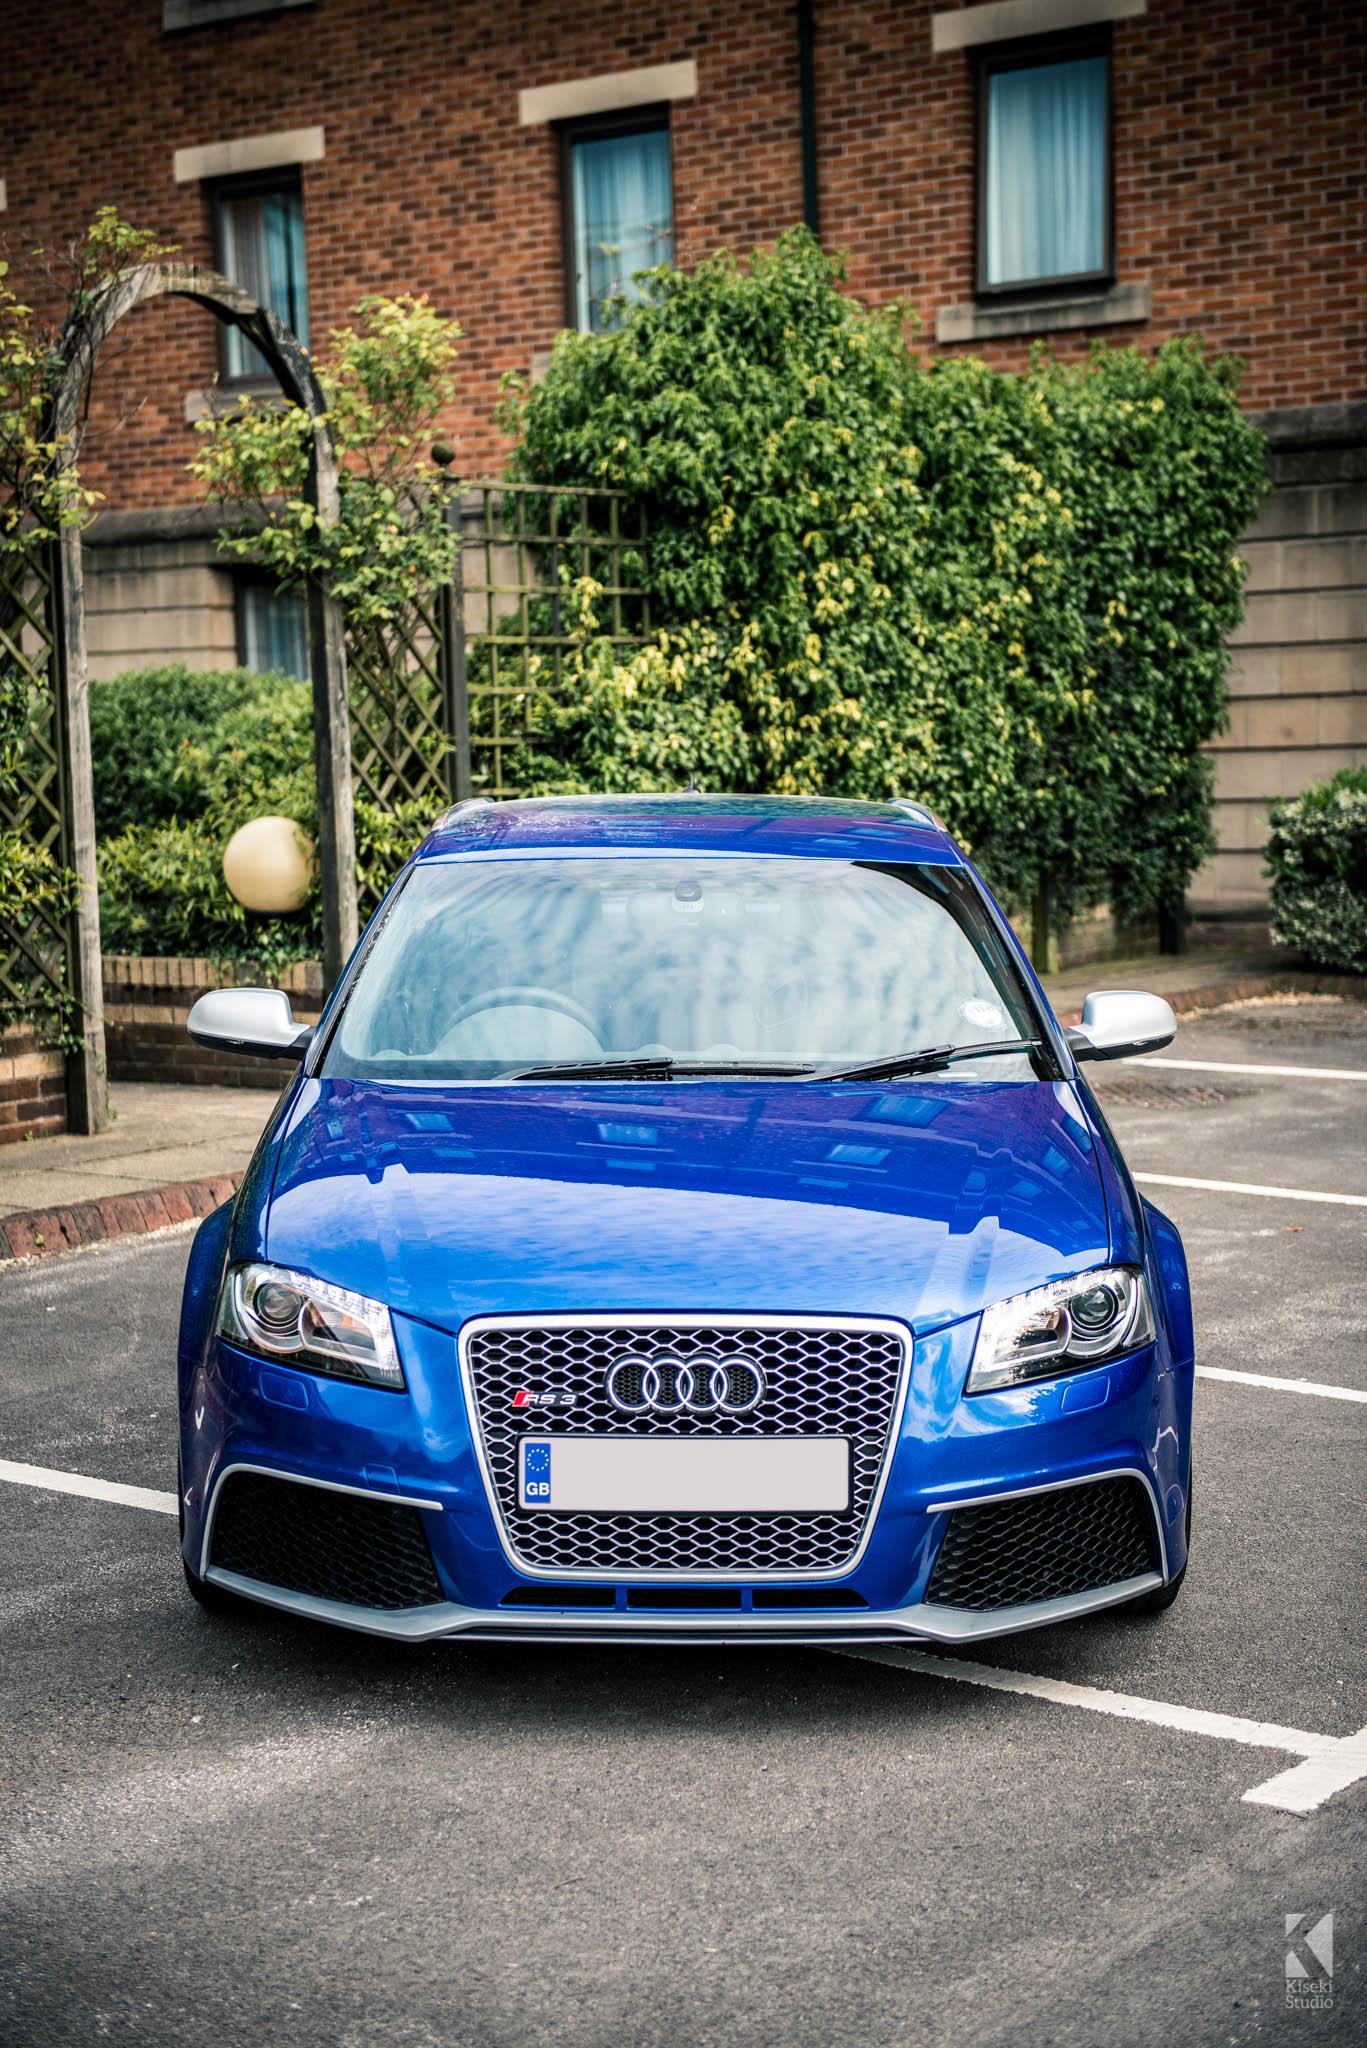 Audi A3 Sportback >> Audi RS3 Sportback in Sepang Blue - Kiseki Studio